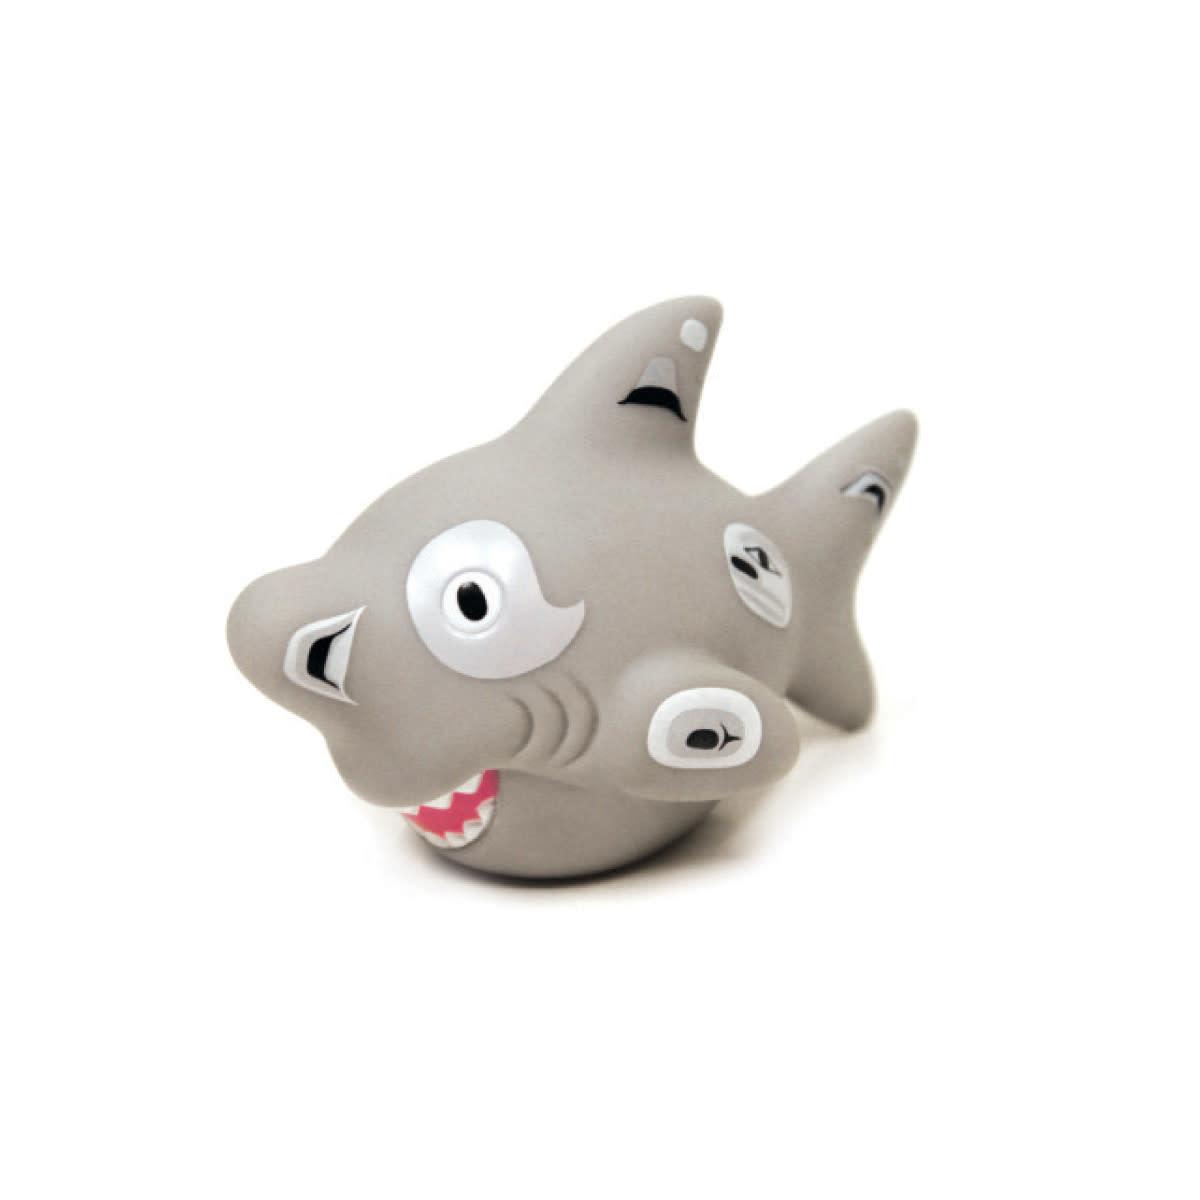 Bath Toy - Shark by Todd Stephens-1